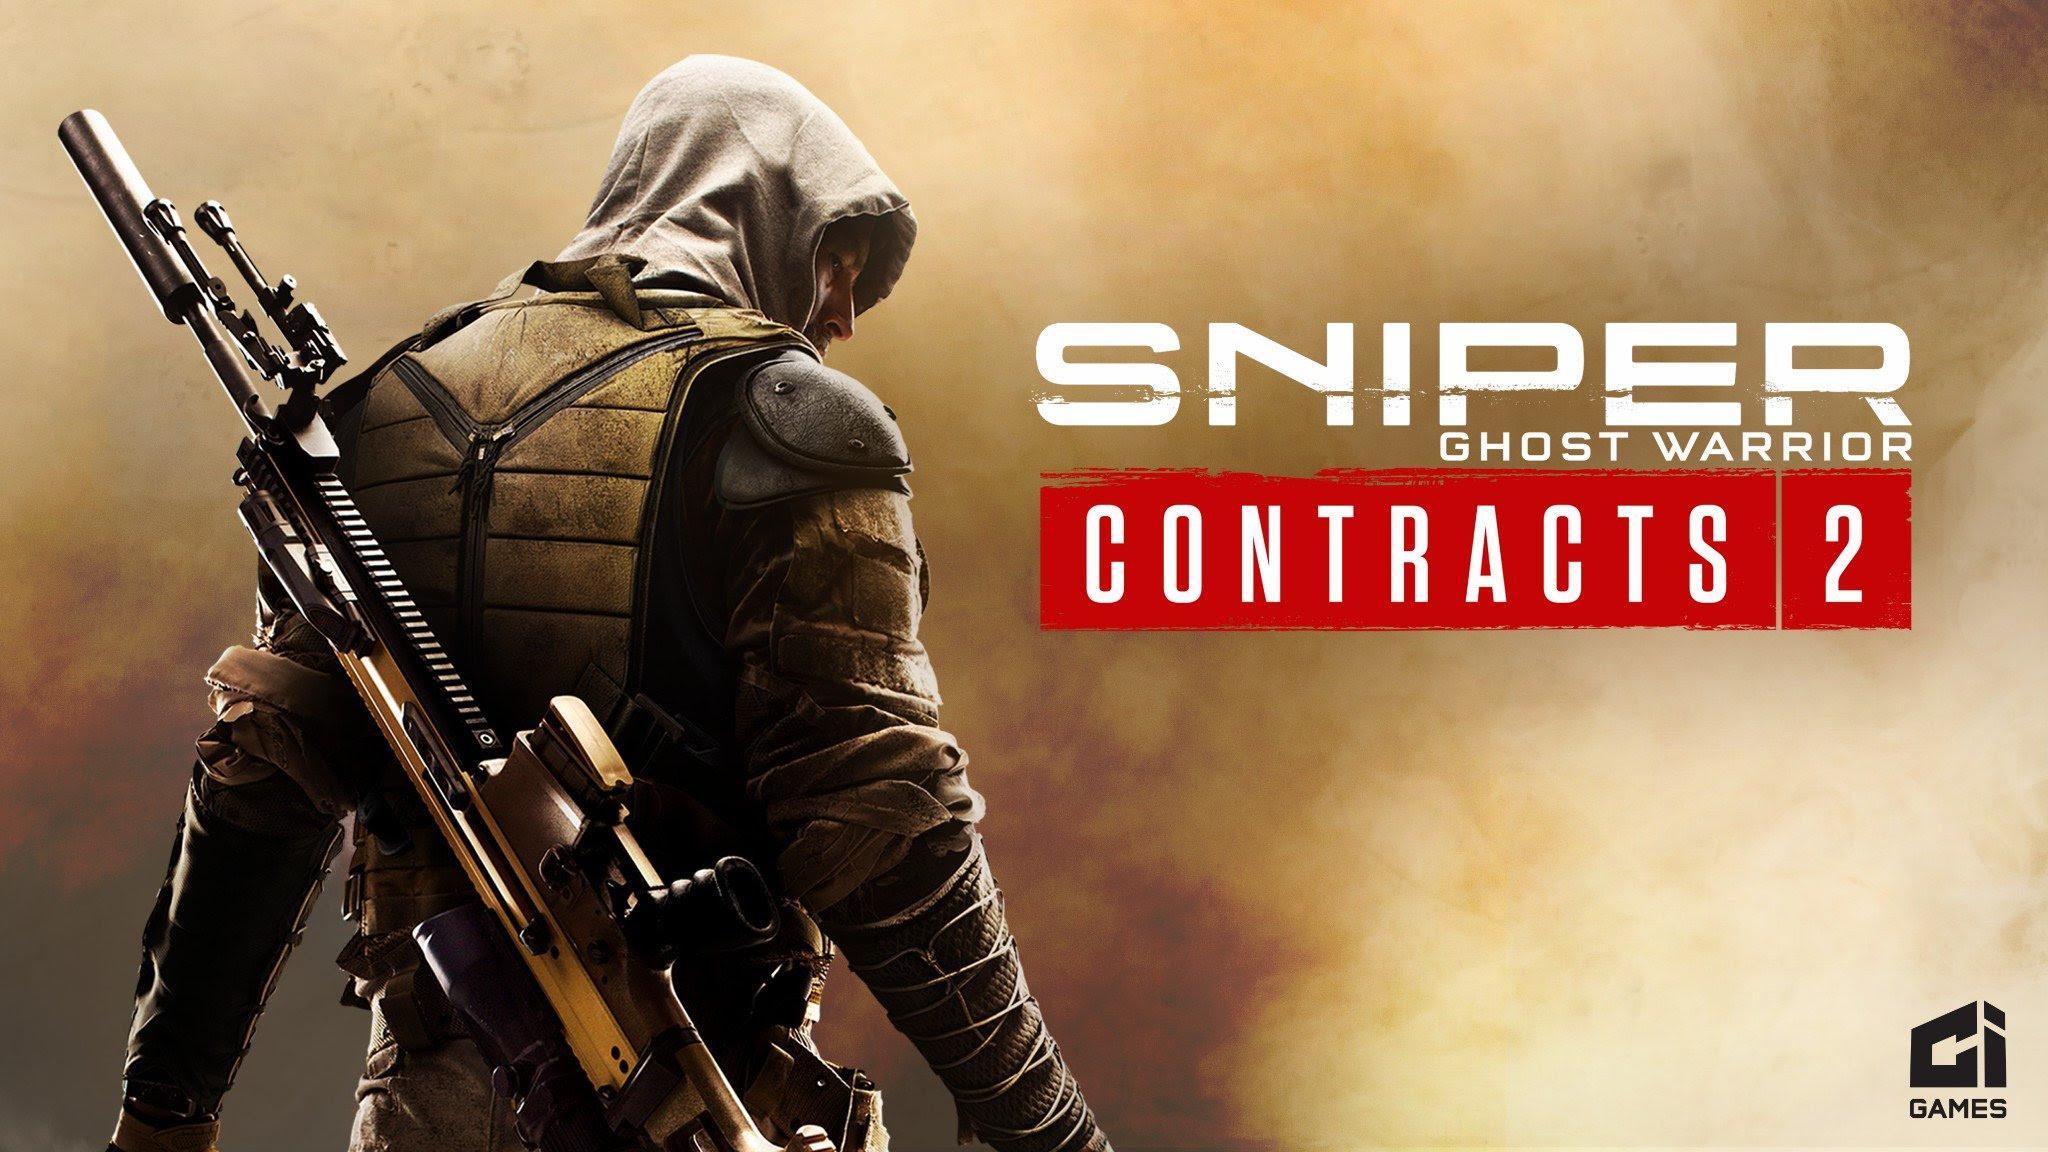 Sniper Ghost Warrior 2382021 1